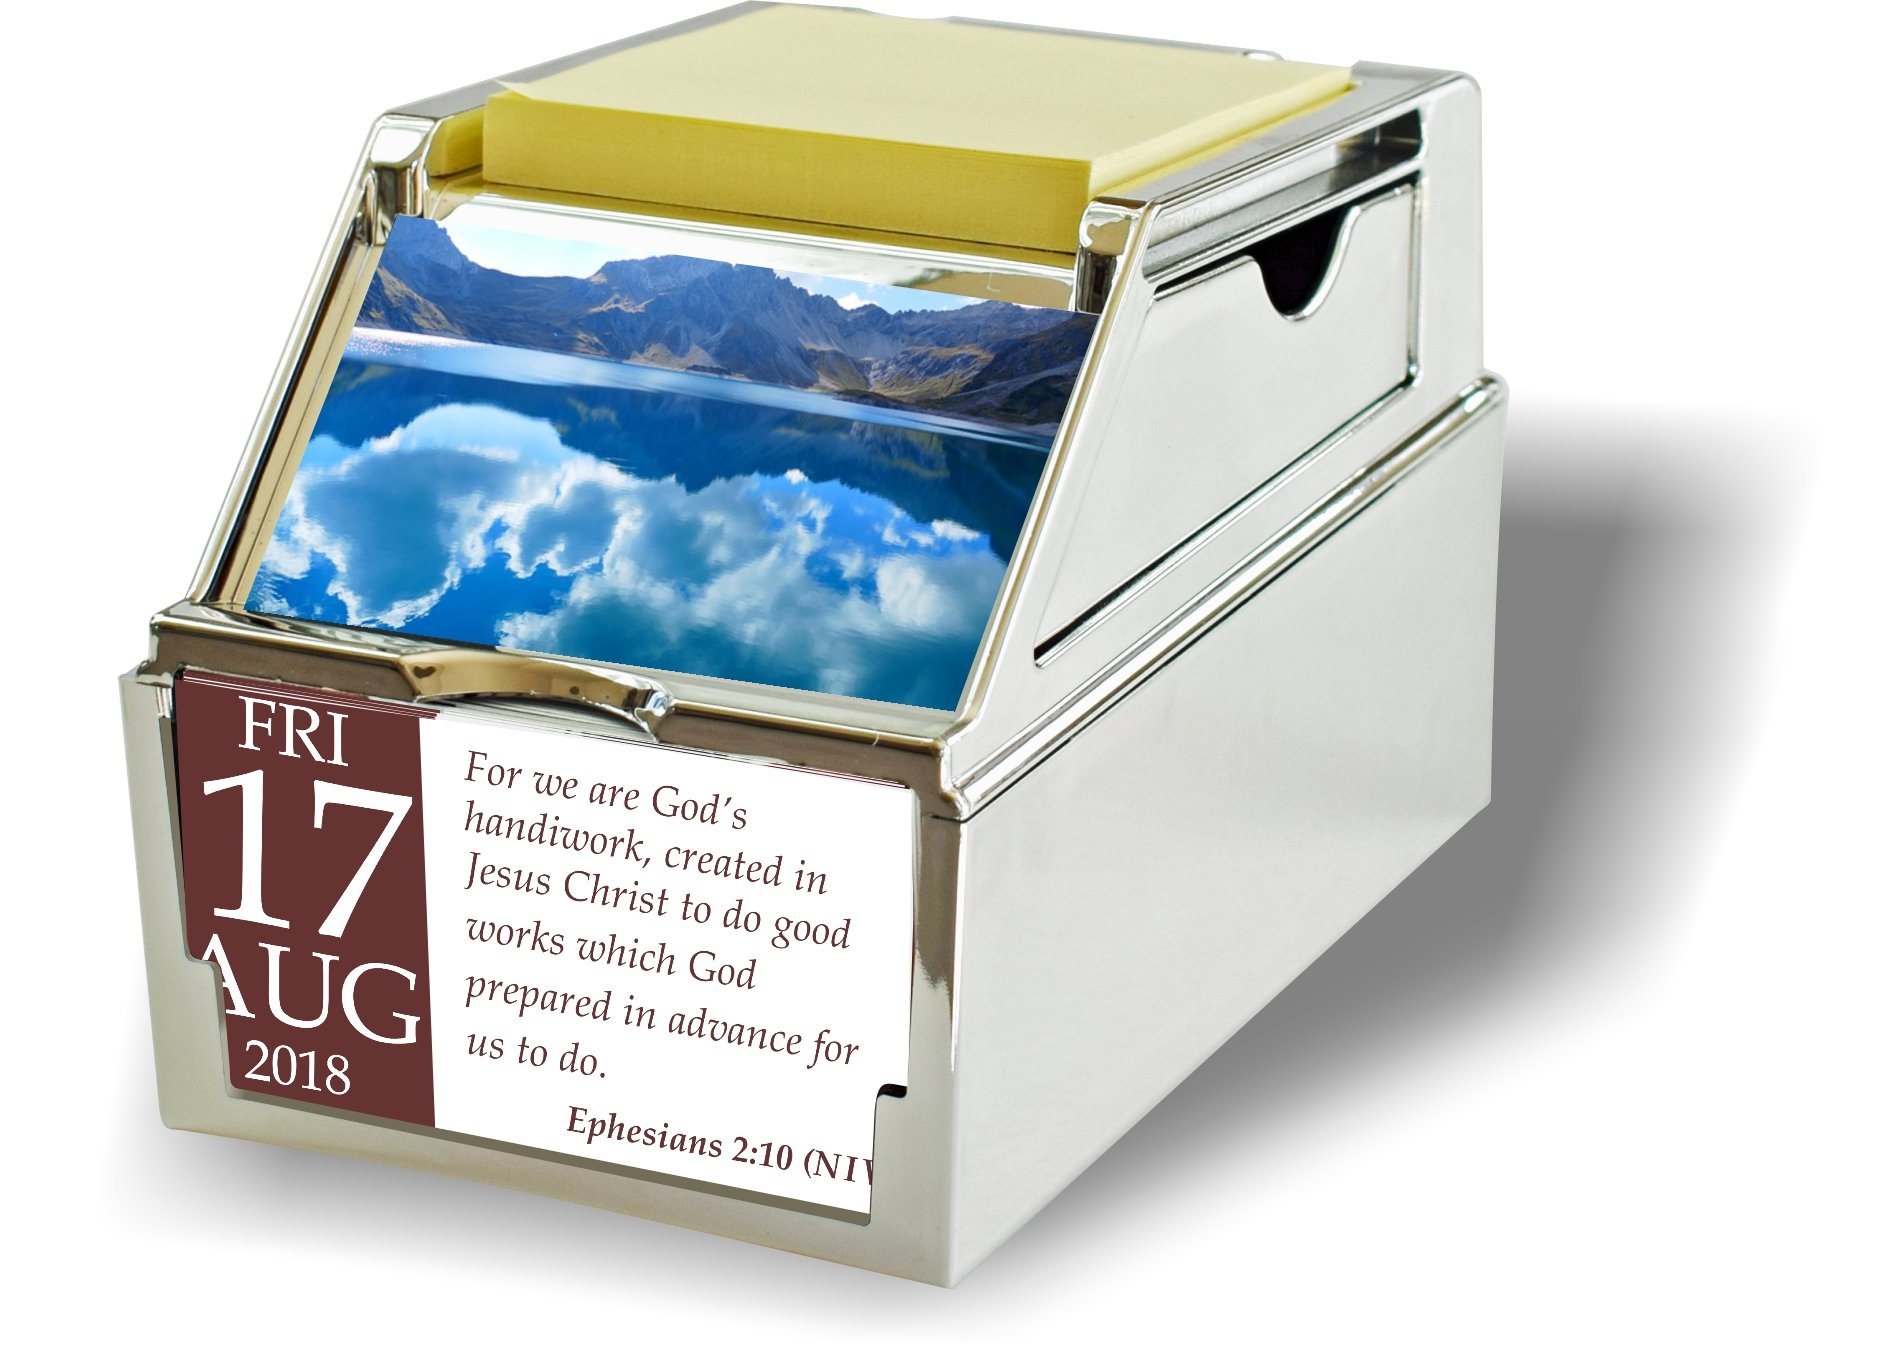 MY FAITH Inspirational Daily Desk Calendar Gift With Reusable Organizer Case (CHROME)